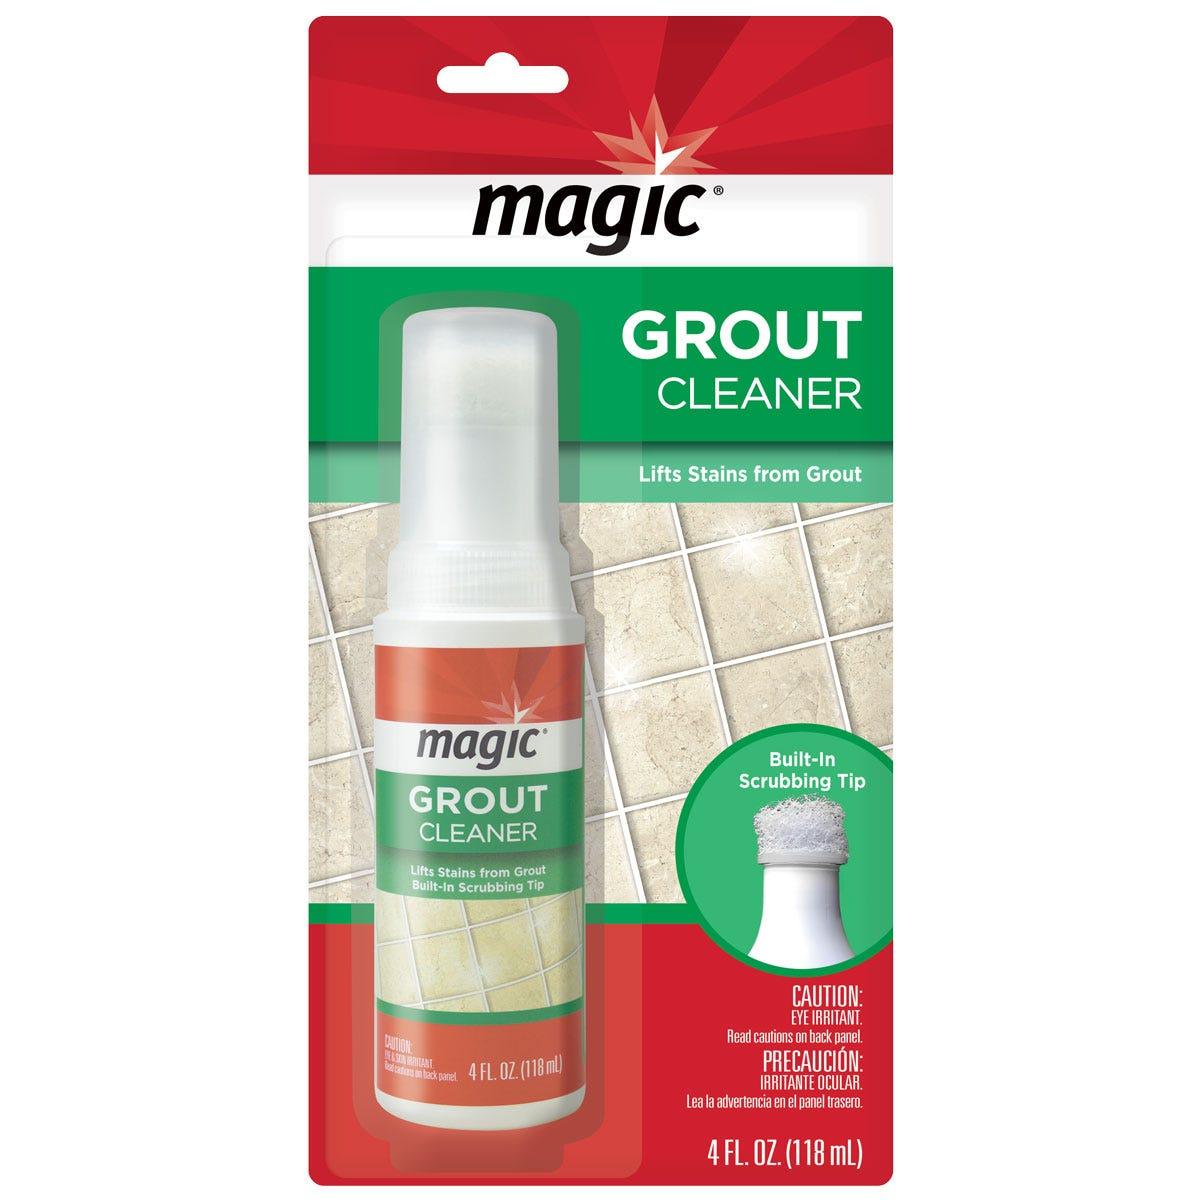 https://googone.com/media/catalog/product/g/r/grout-cleaner-scrubbing-tip_front_1.jpg